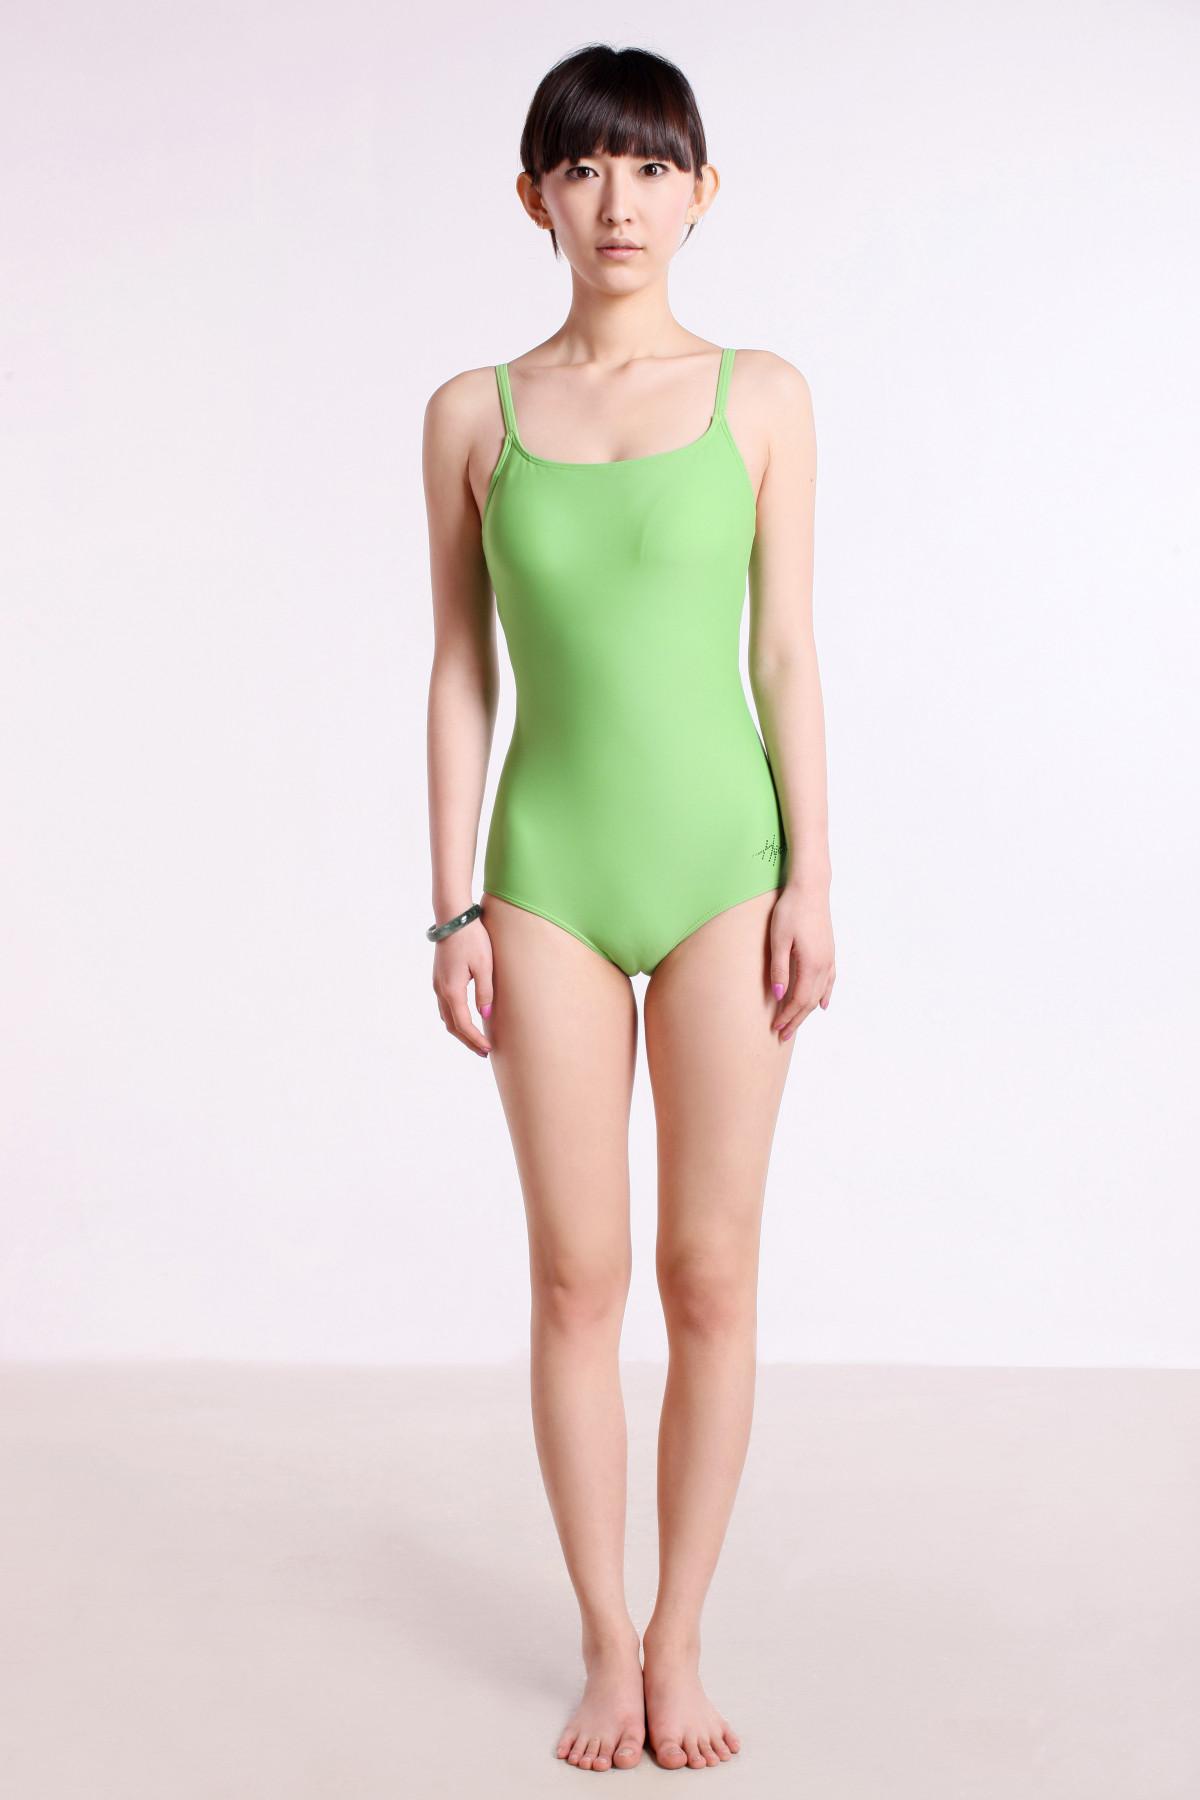 Free Images : female, leg, dance, pattern, spring, fashion ...